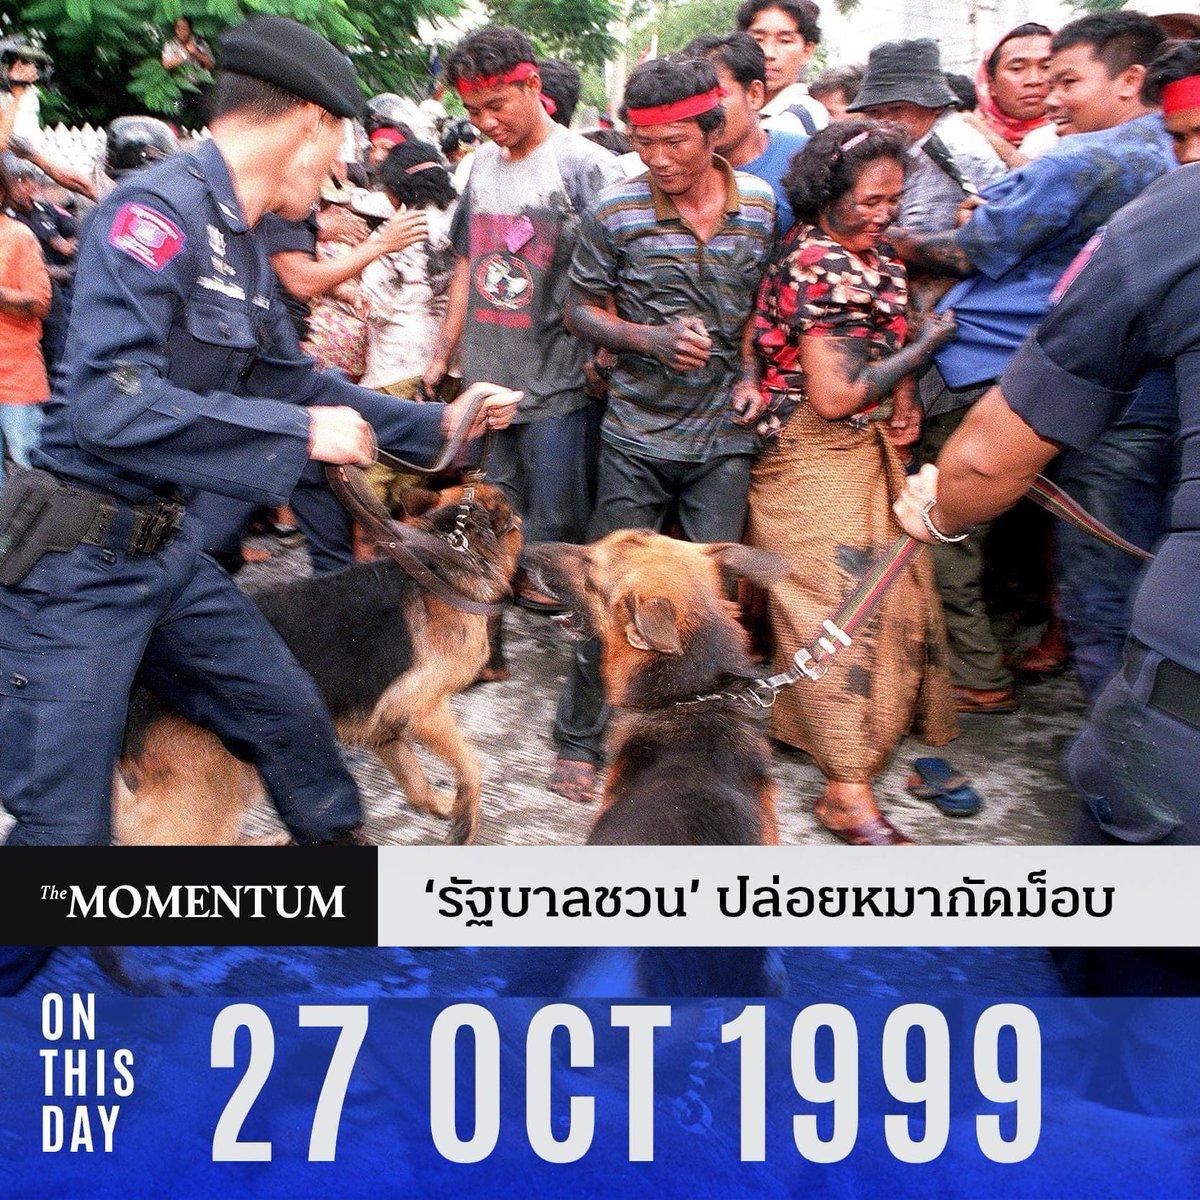 #OnThisDay  27 ตุลาคม 2543: #รัฐบาลชวน ปล่อยหมากัดม็อบ  รายละเอียด https://t.co/HSMxemDIzq  #TheMomentum #ประชาธิปัตย์ #ม็อบมันสำปะหลัง #วันนี้ในอดีต #การเมืองไทยในอดีต https://t.co/g9uJ8t2OVh